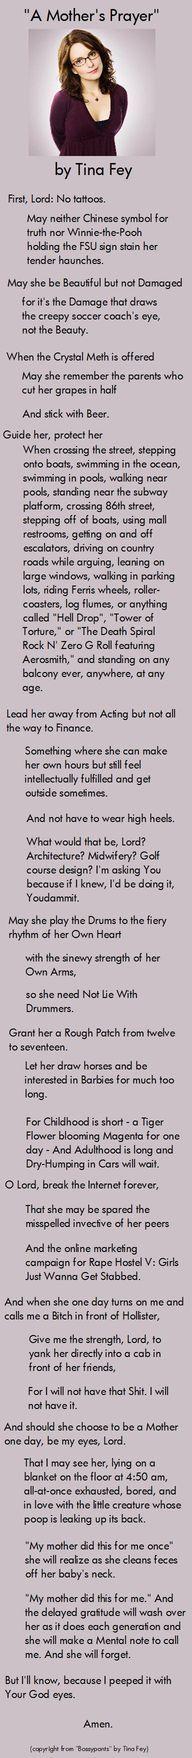 mother's prayer by tina fey